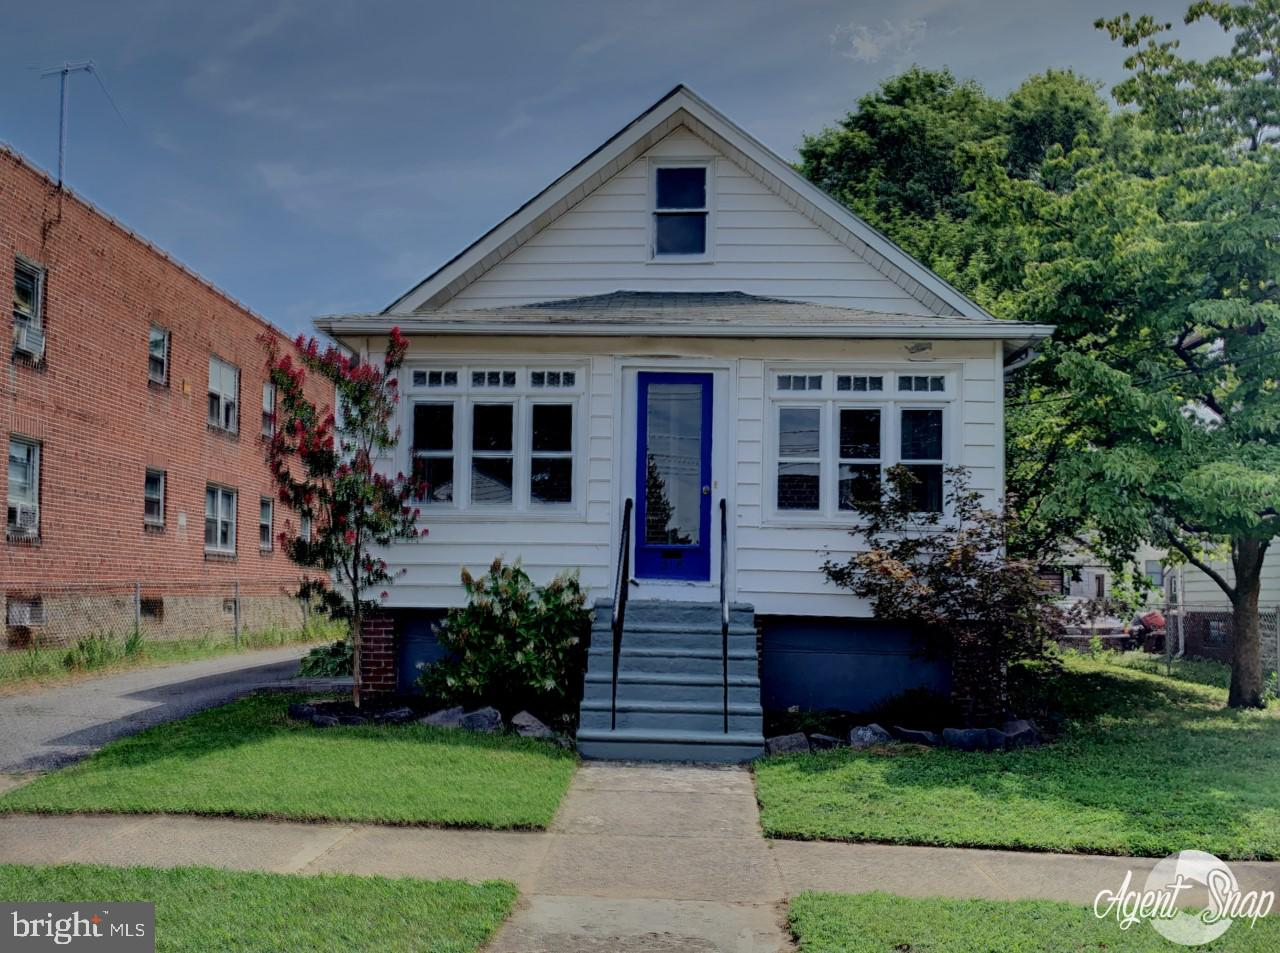 218 TAYLOR AVENUE, ESSINGTON, PA 19029